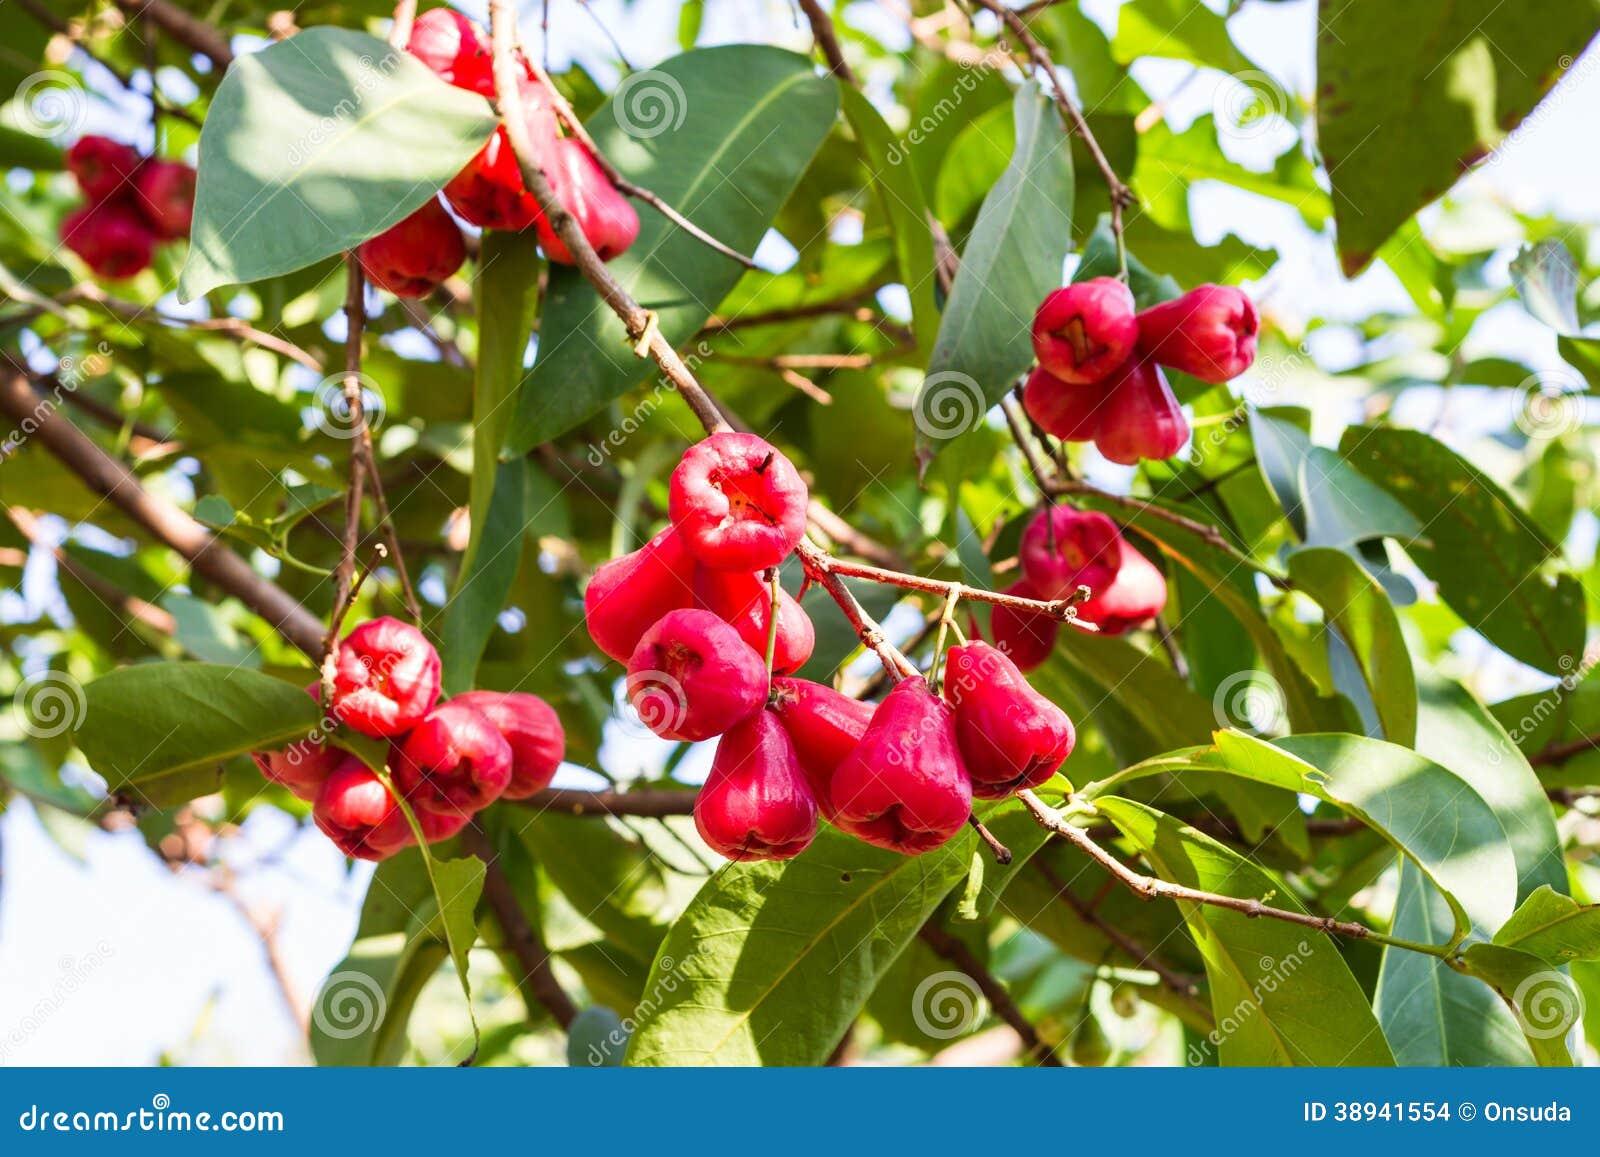 Rose apple tree stock photo. Image of asia, food, apple - 38941554